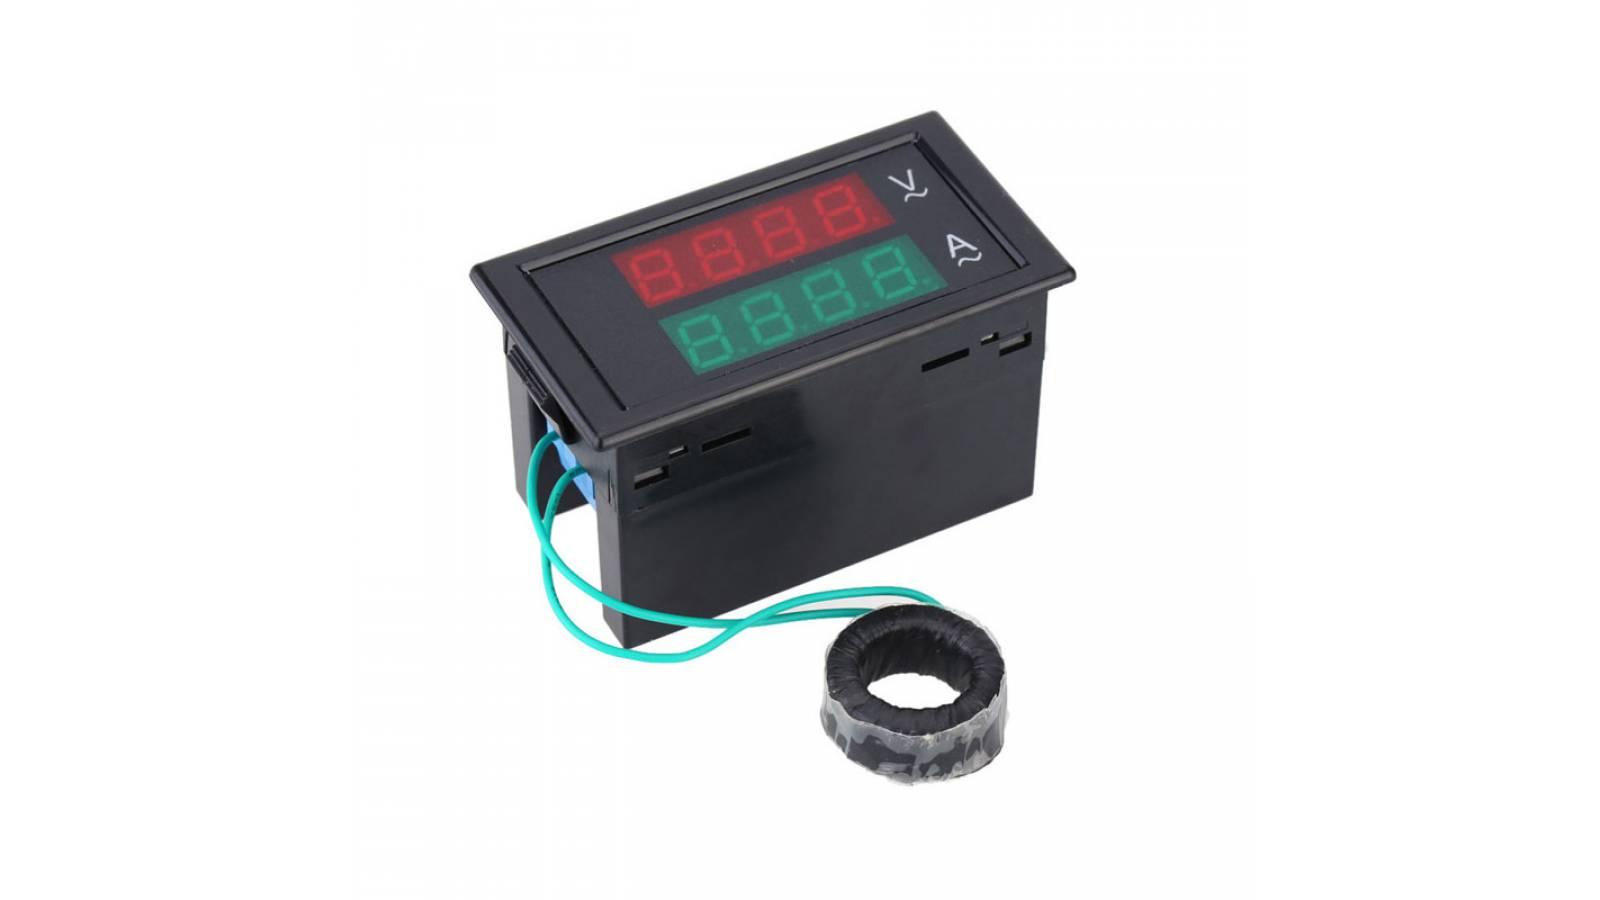 Voltímetro y Amperímetro Digital 2 en 1 GAV-200450 AC240-450V / 100.0A